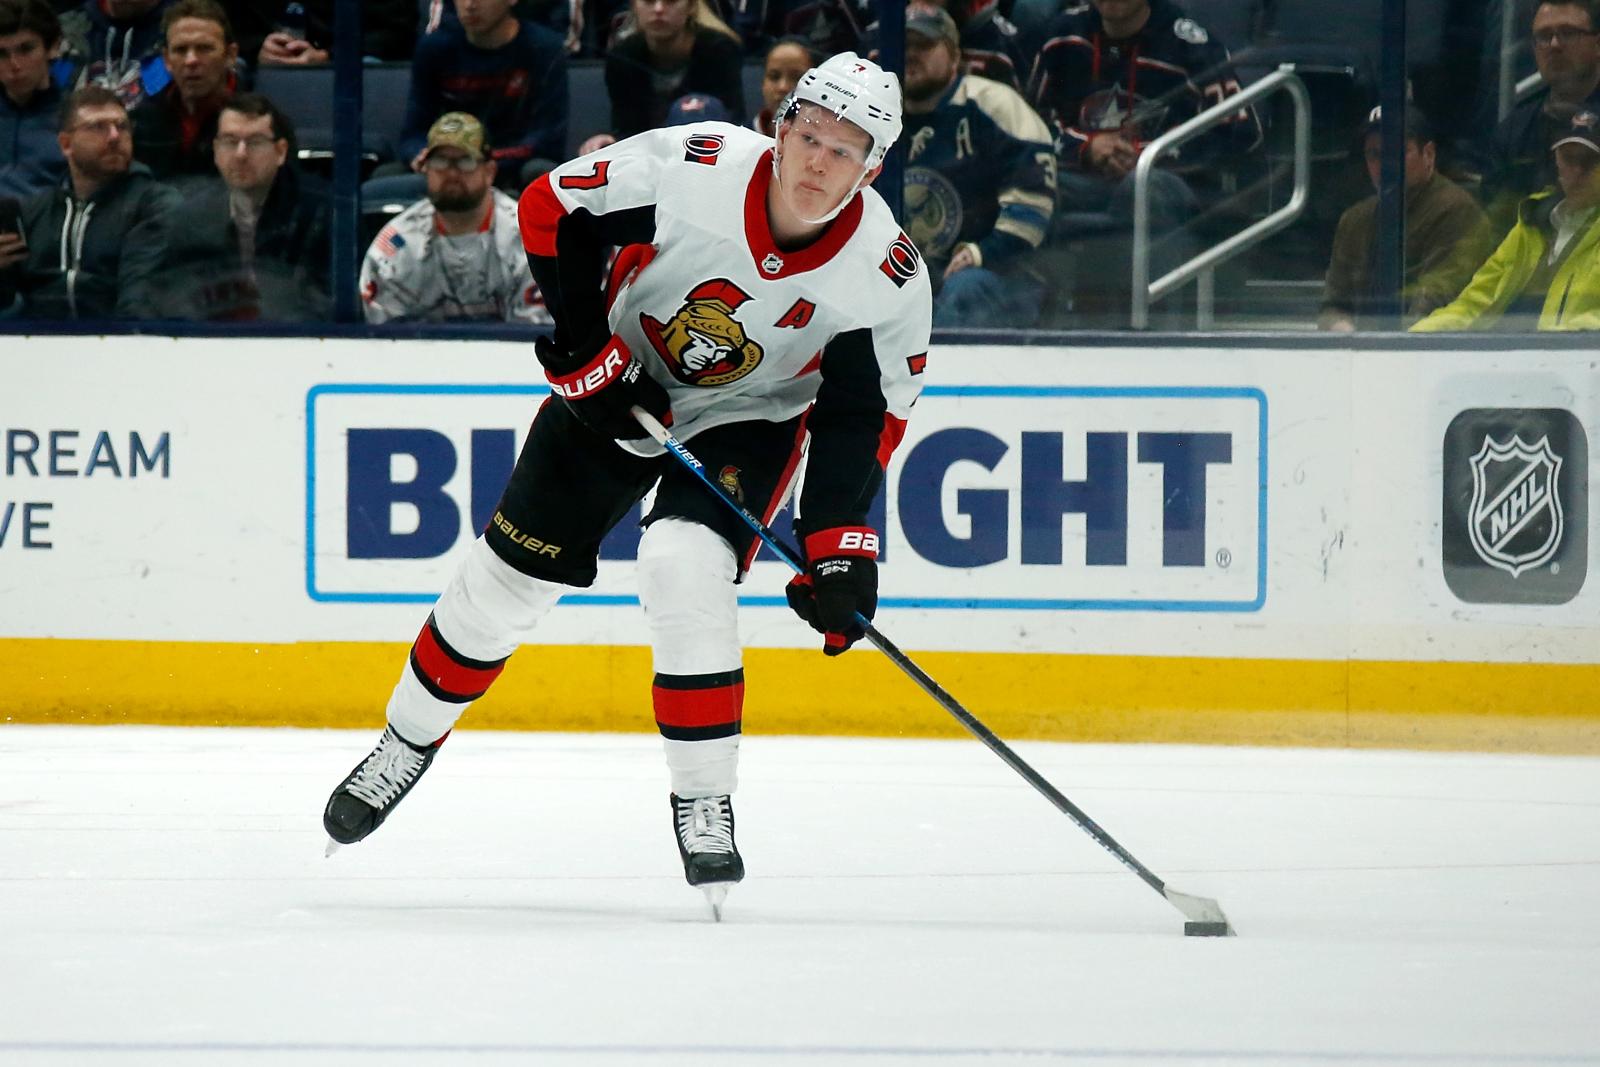 Ottawa Senators: 4 takeaways from 2-1 win over San Jose Sharks